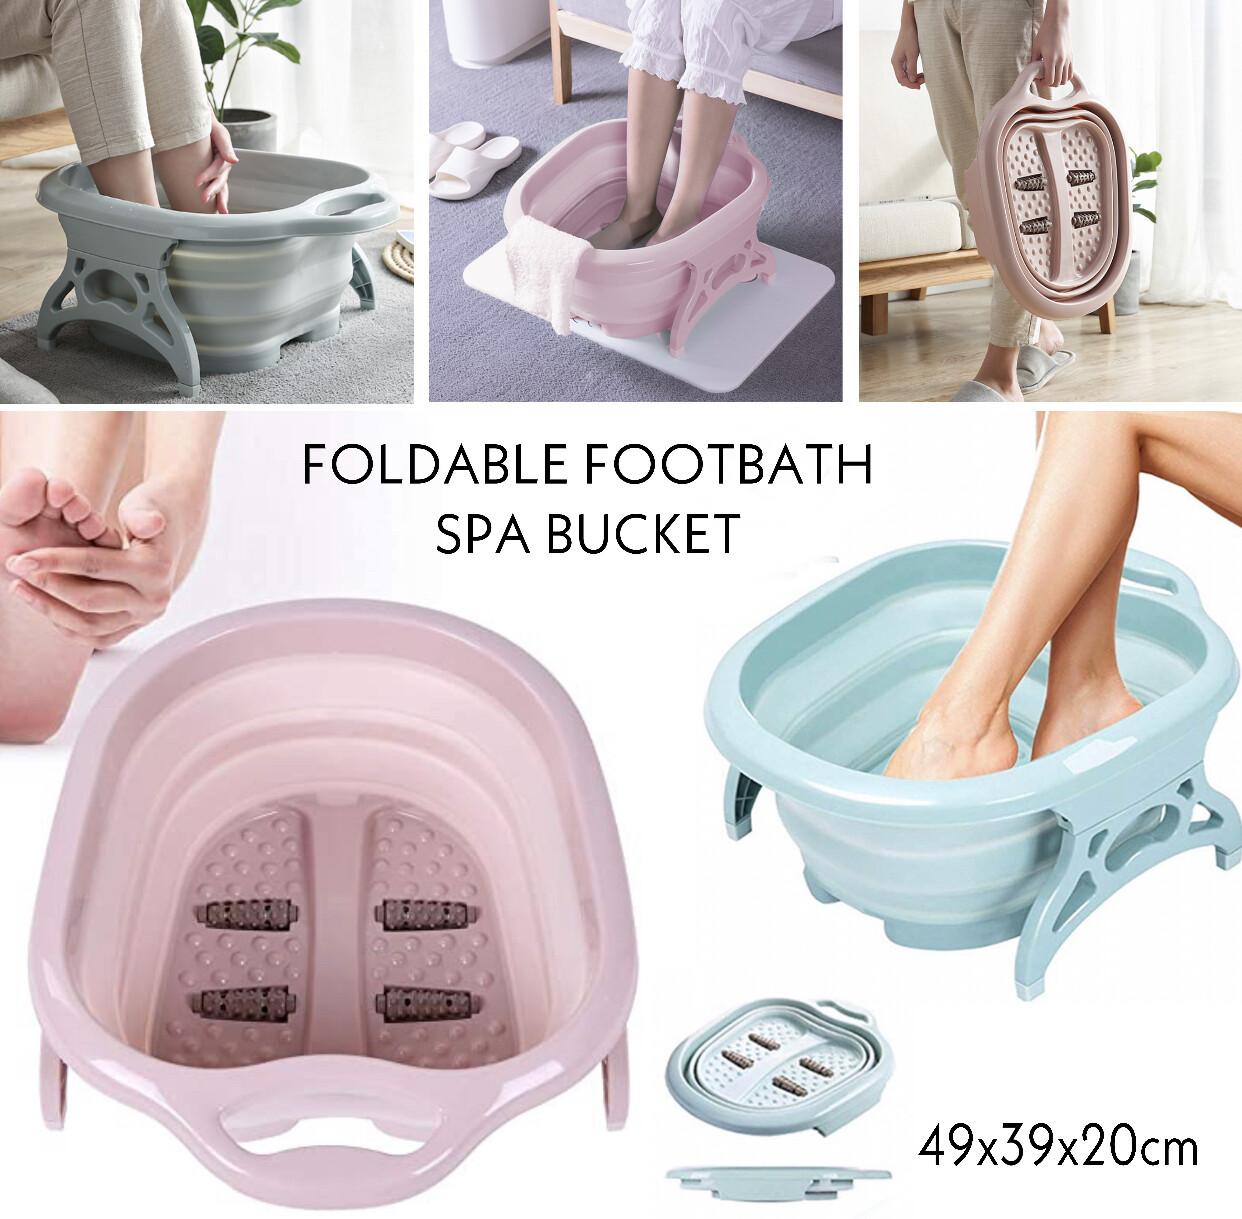 Foldable Footbath Bucket